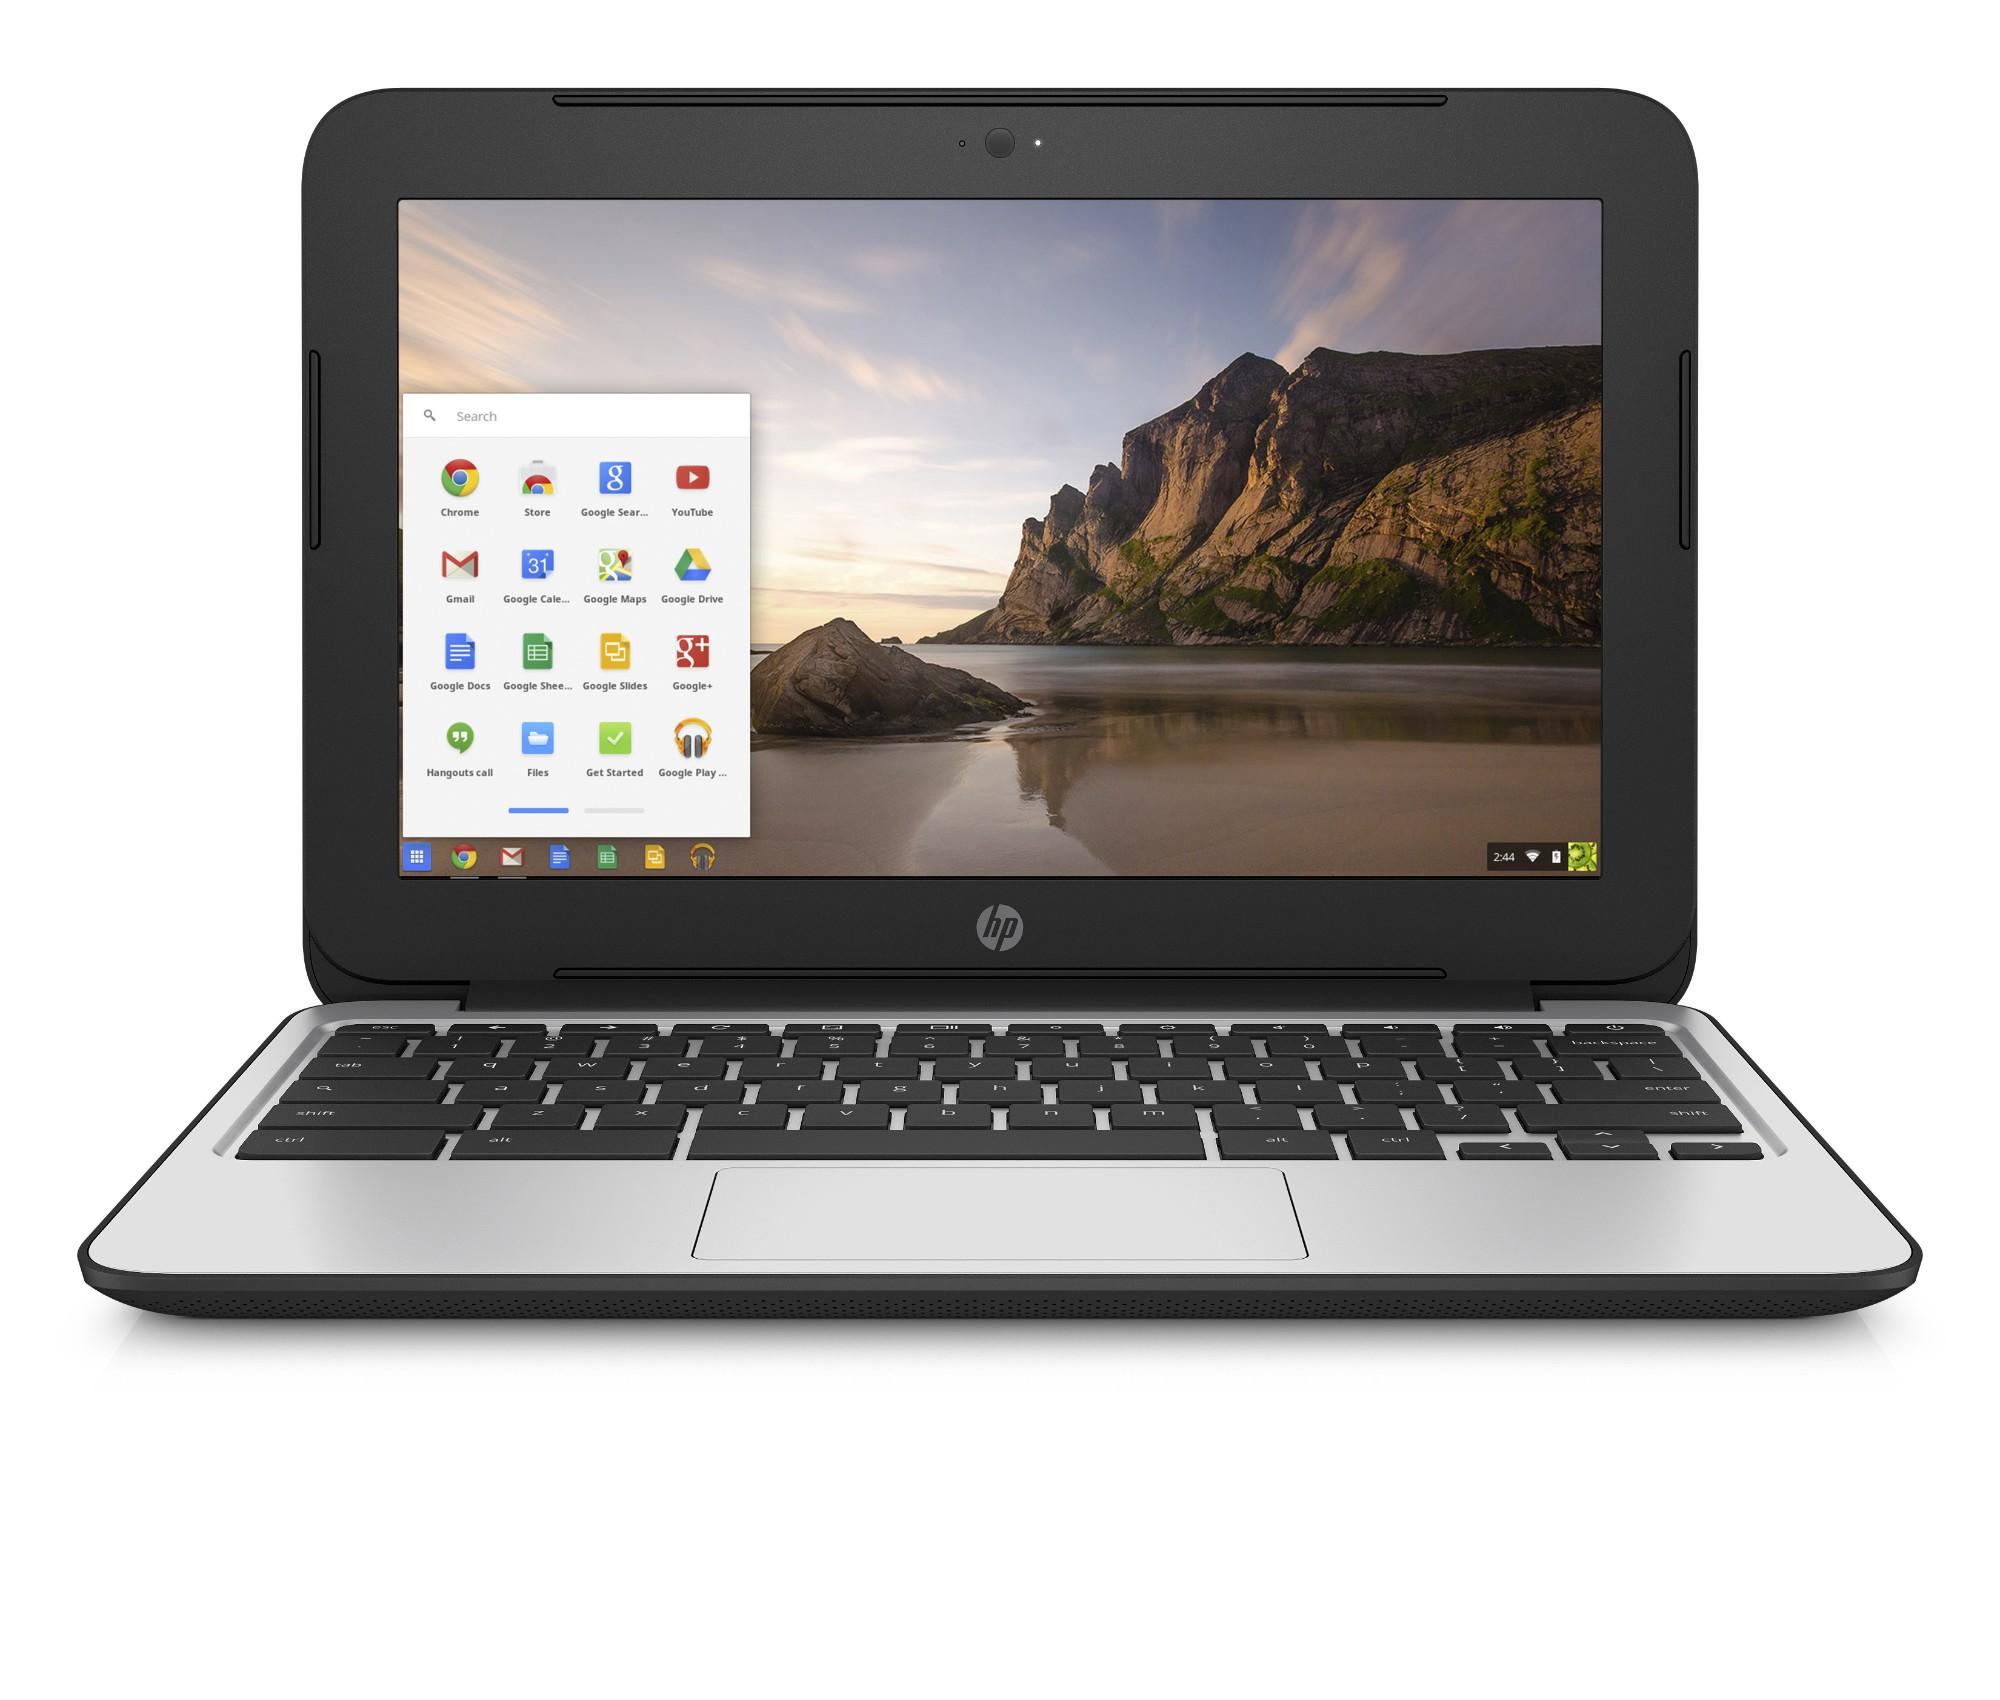 HP Chromebook 11 G4 Black,Silver 29.5 cm (11.6